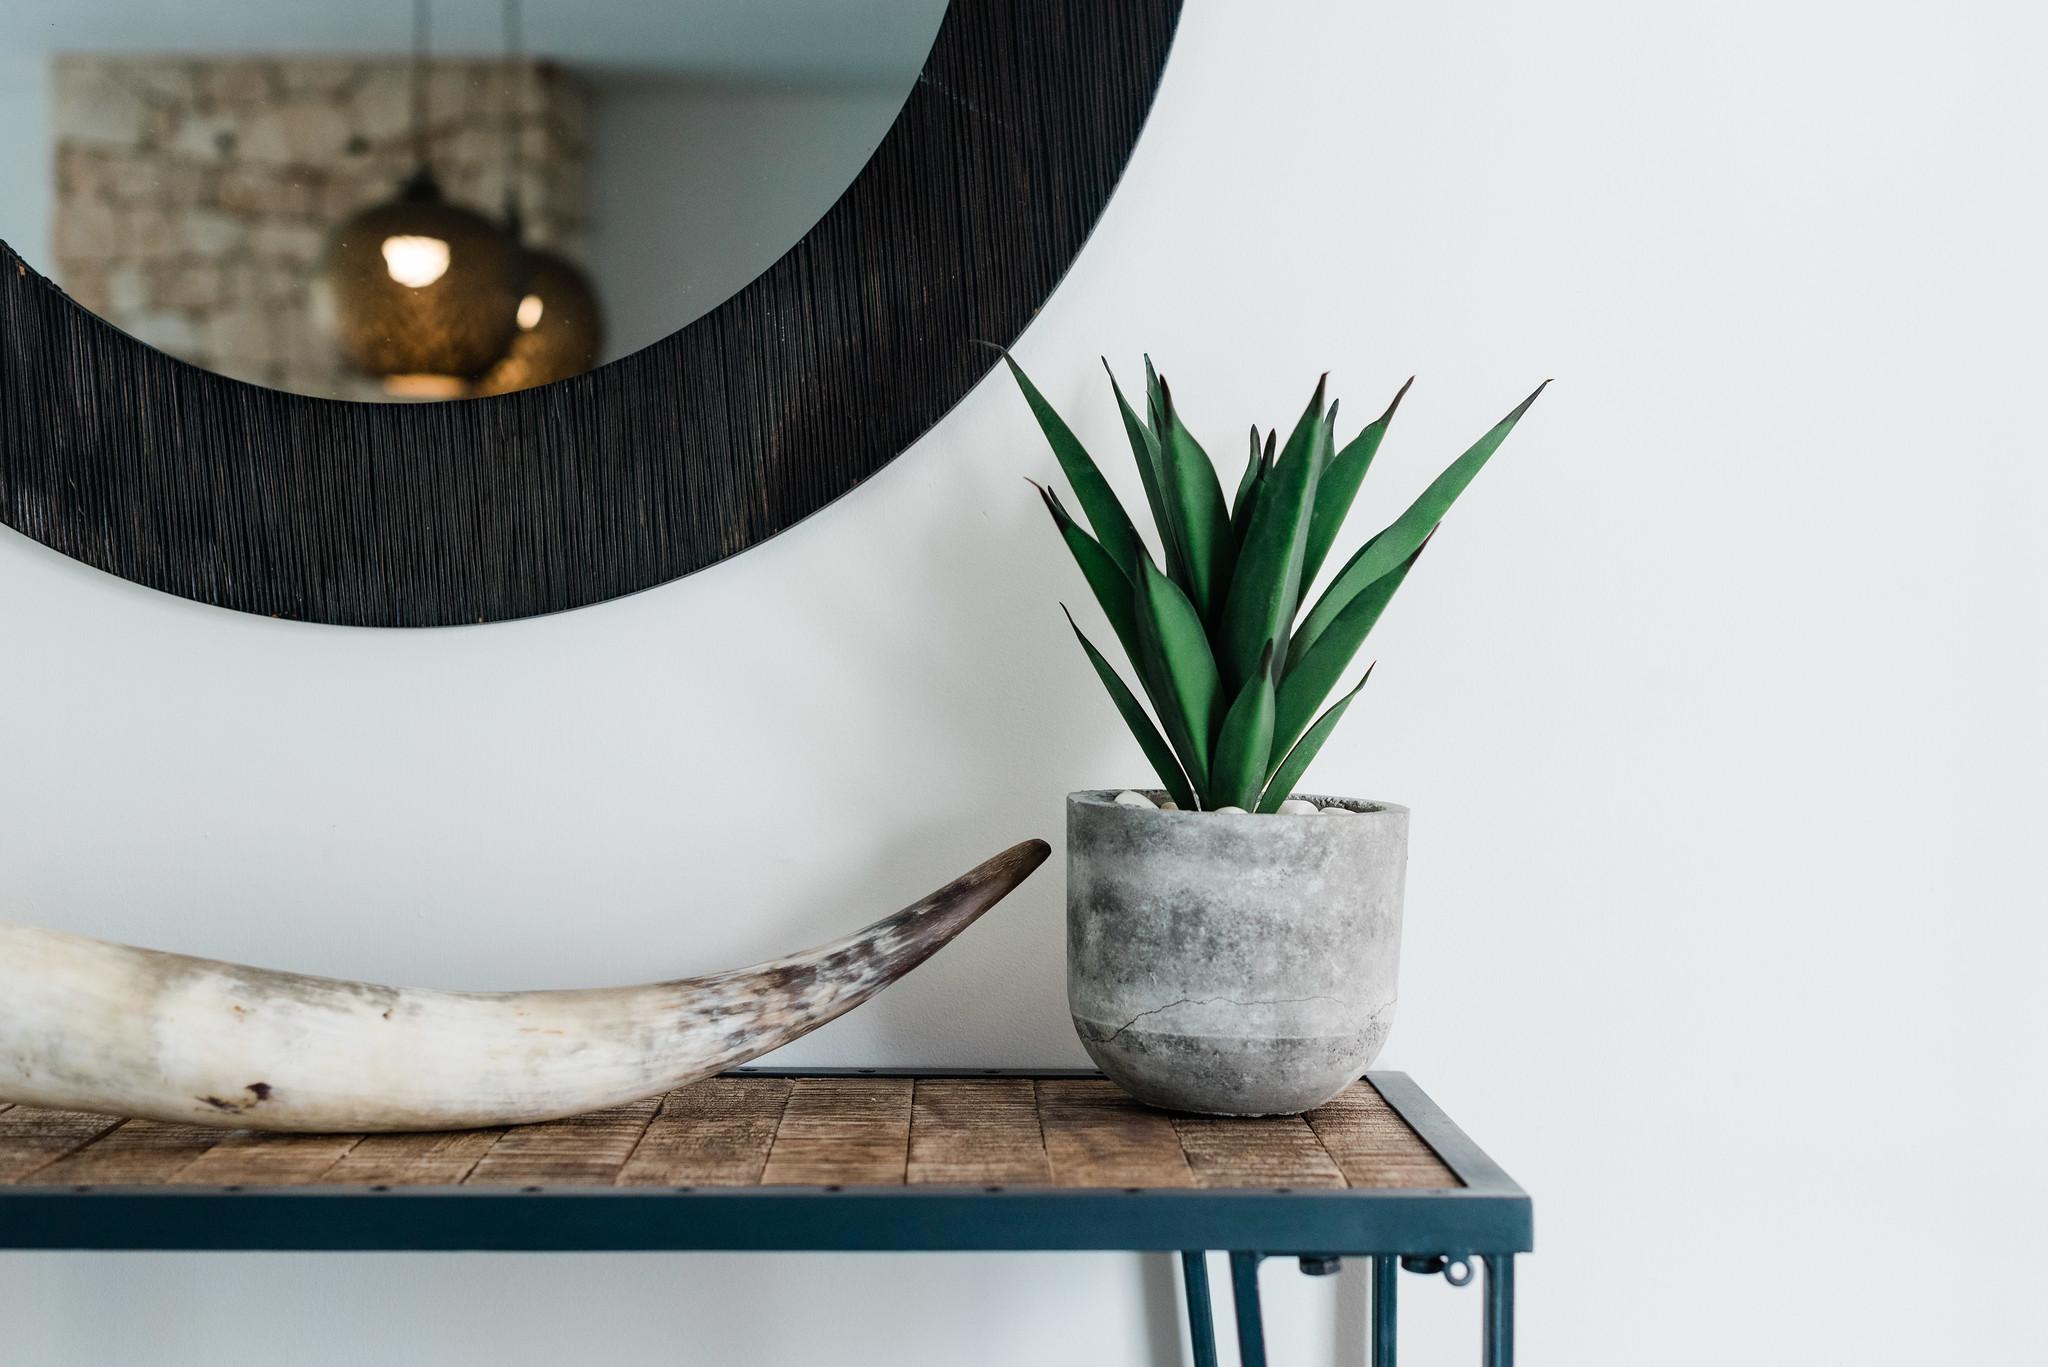 https://www.white-ibiza.com/wp-content/uploads/2020/05/white-ibiza-villas-can-verde-interior-details.jpg